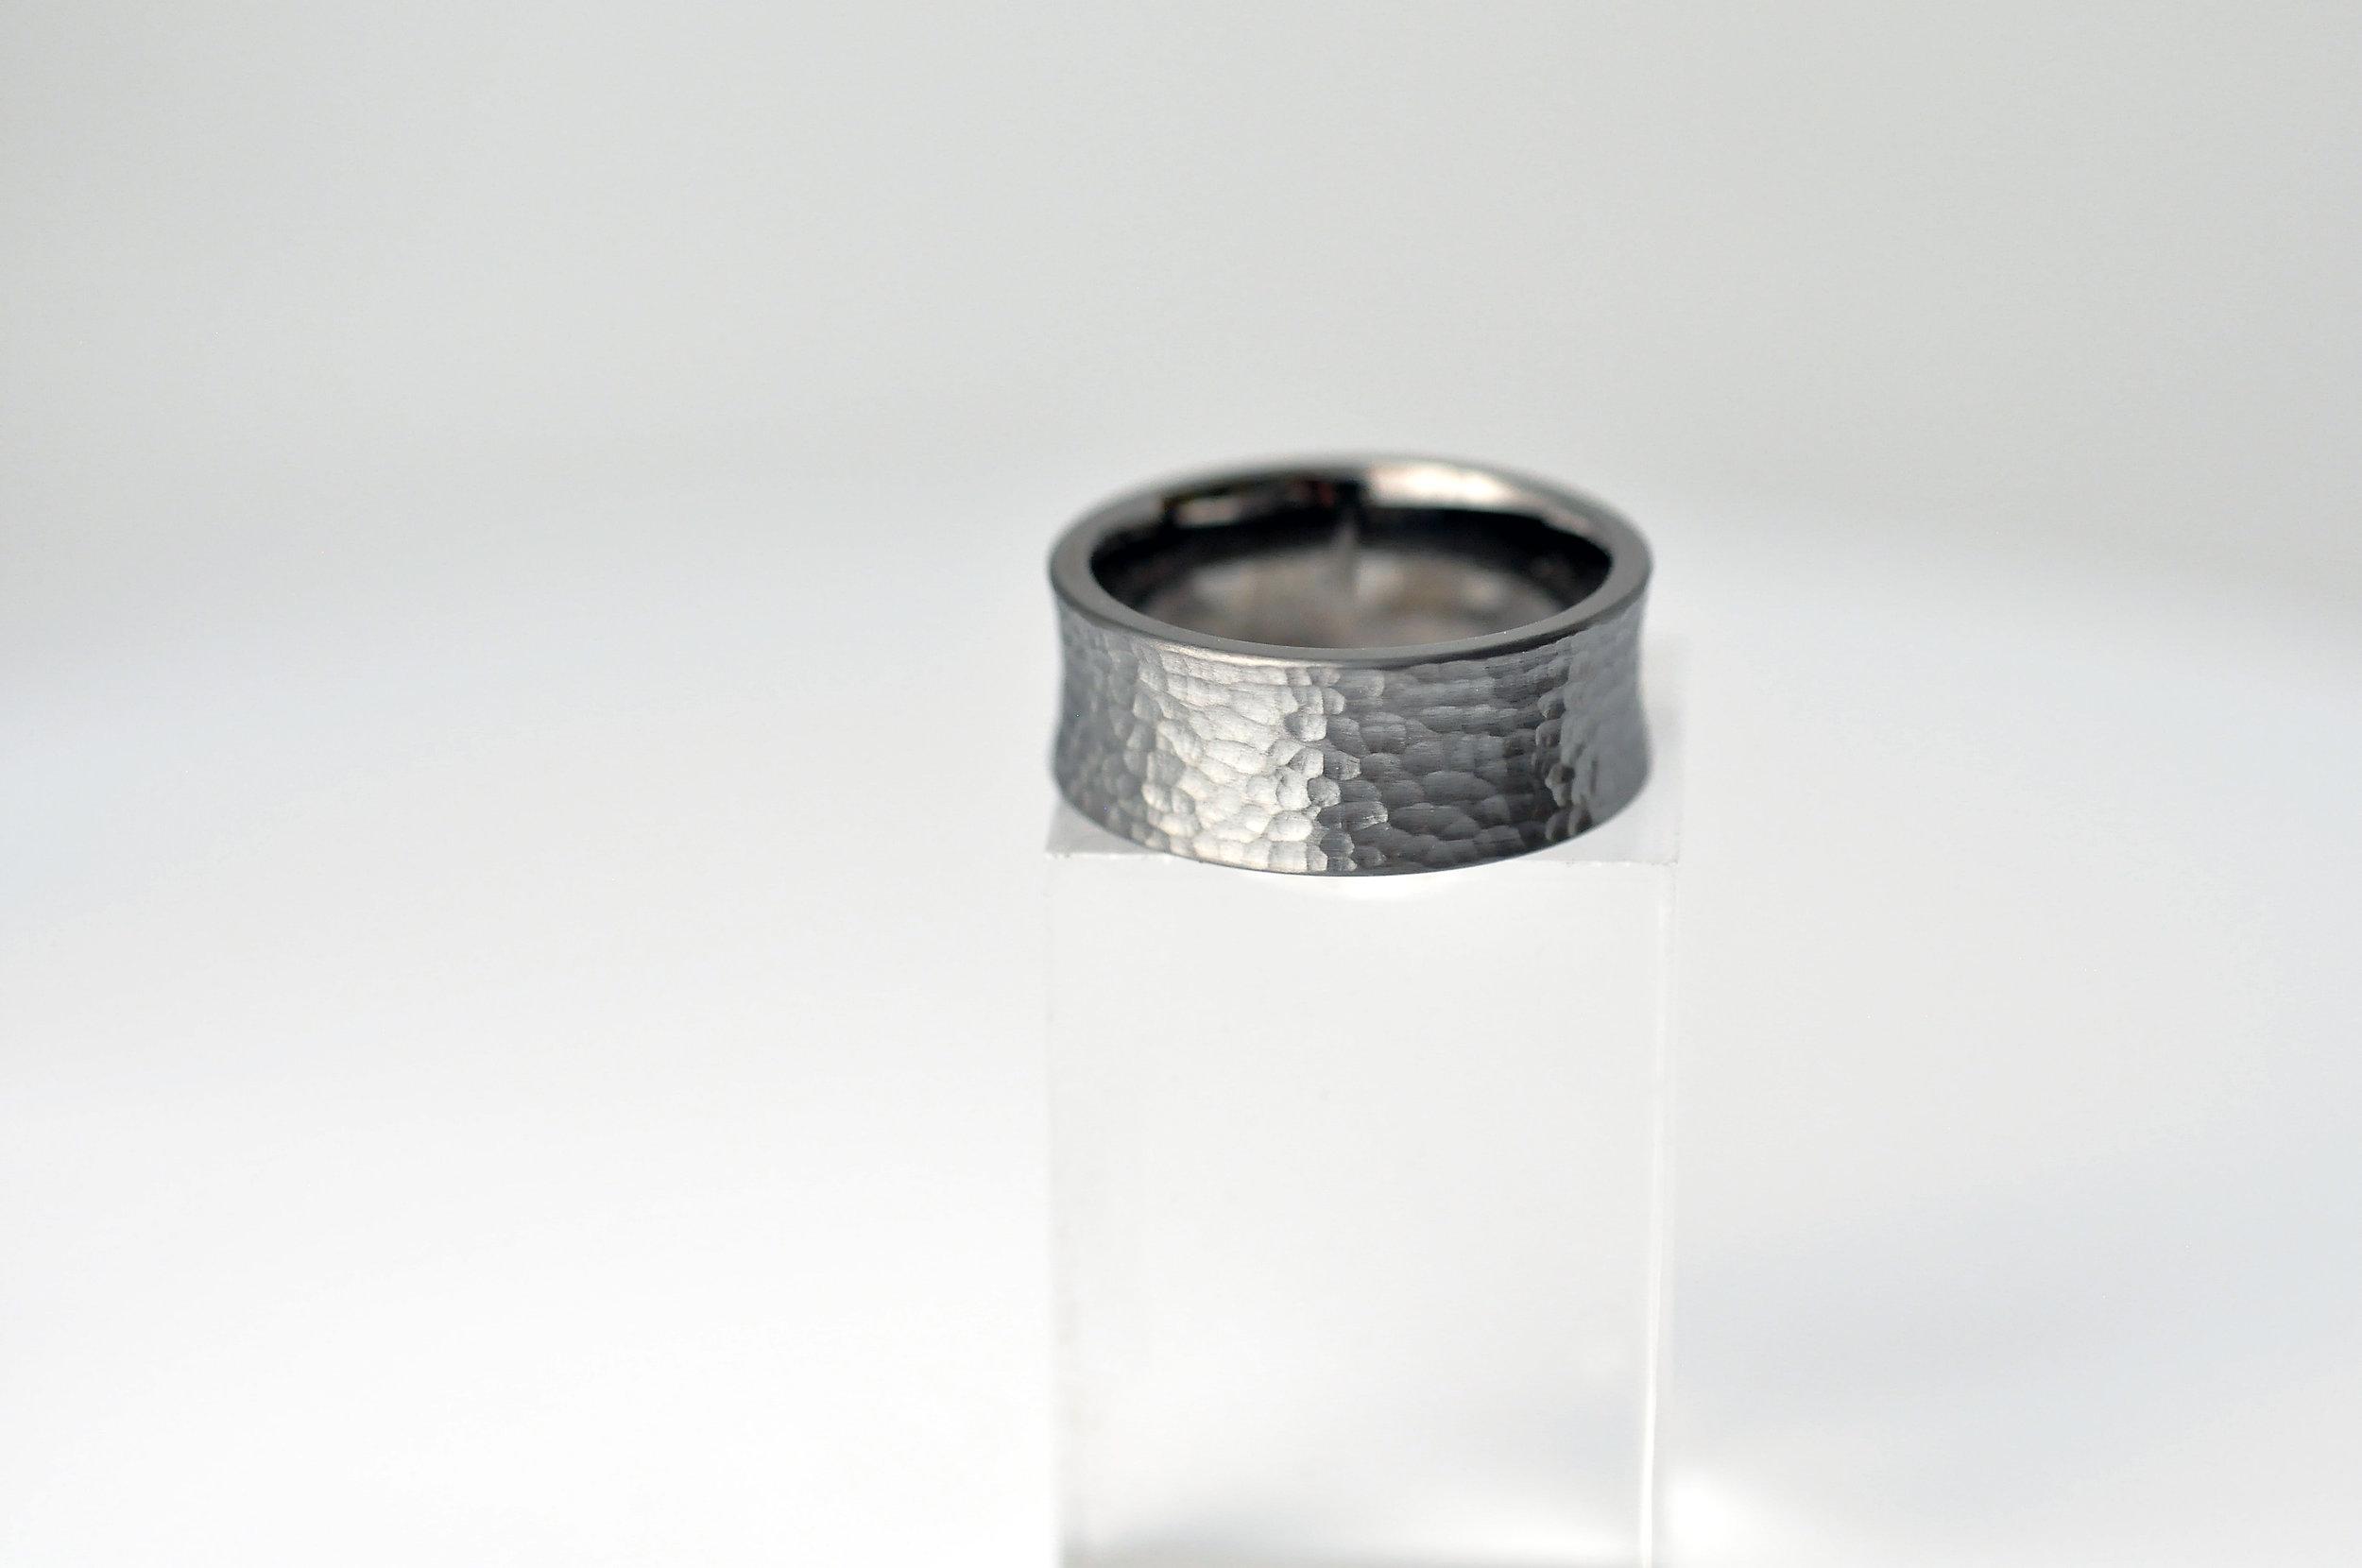 Black Men's Rugged Ring Toronto.jpg